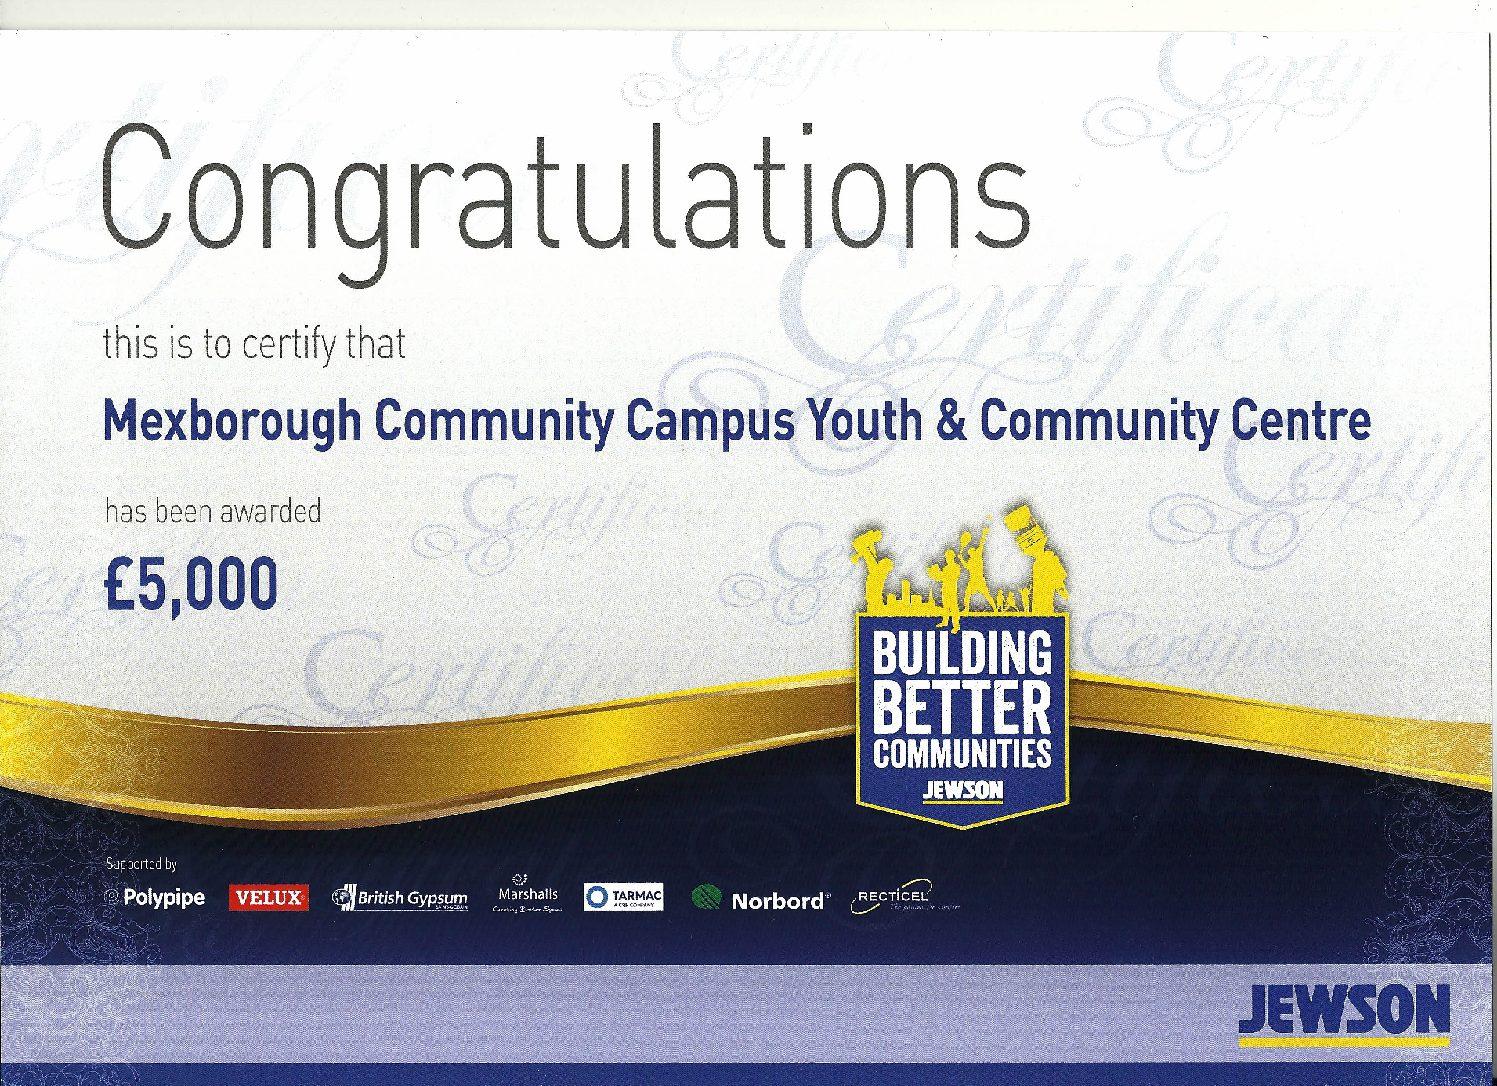 Jewson – Building Better Communities